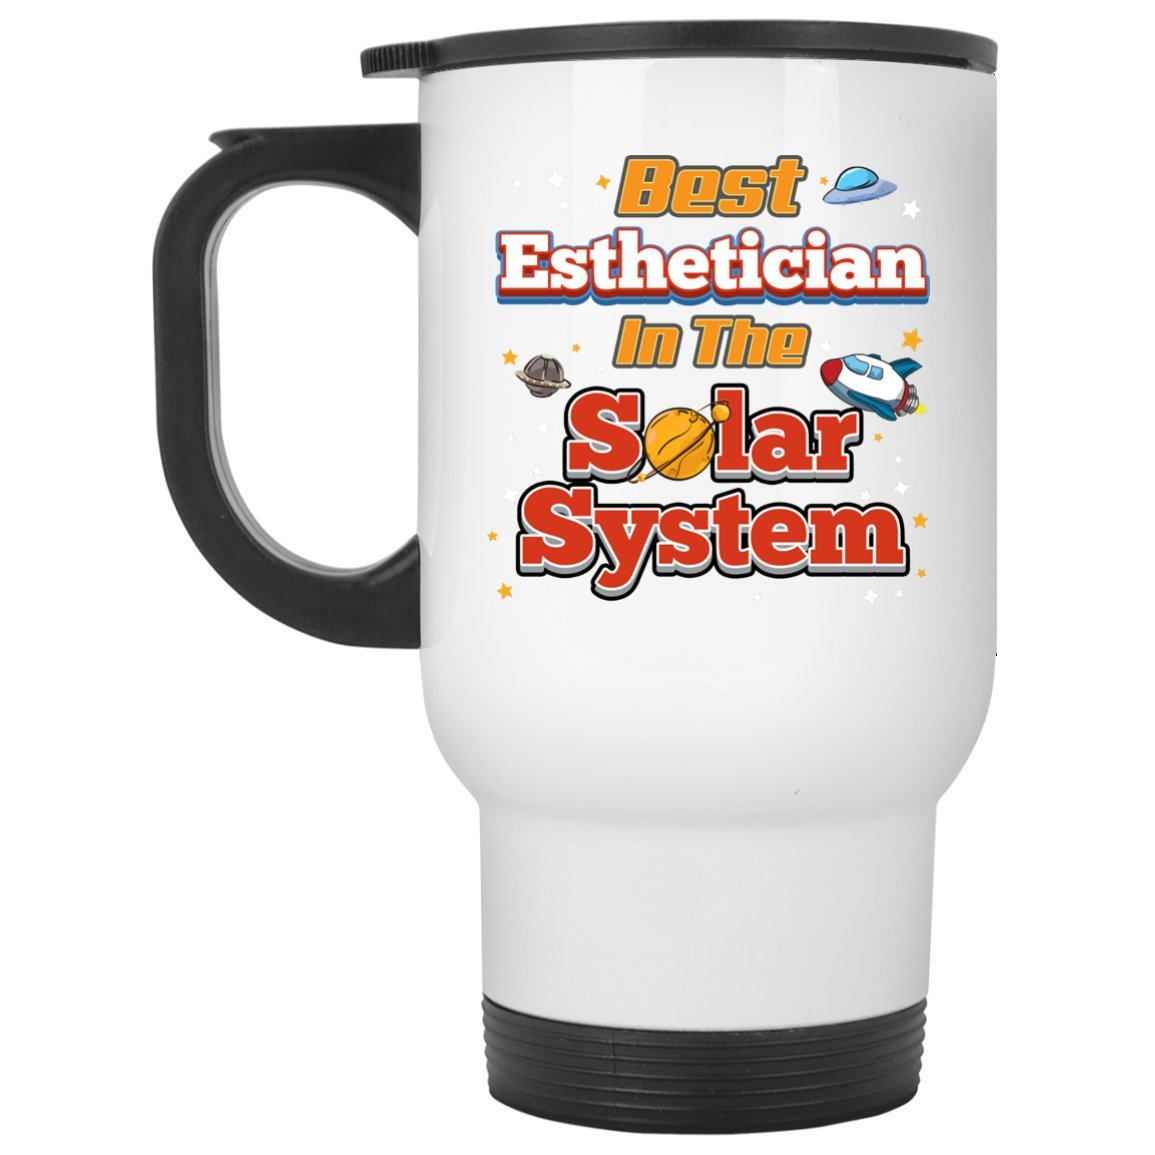 Esthetician Mug-Best Esthetician In The Solar System-Esthetician Travel Mug Esthetician Gifts